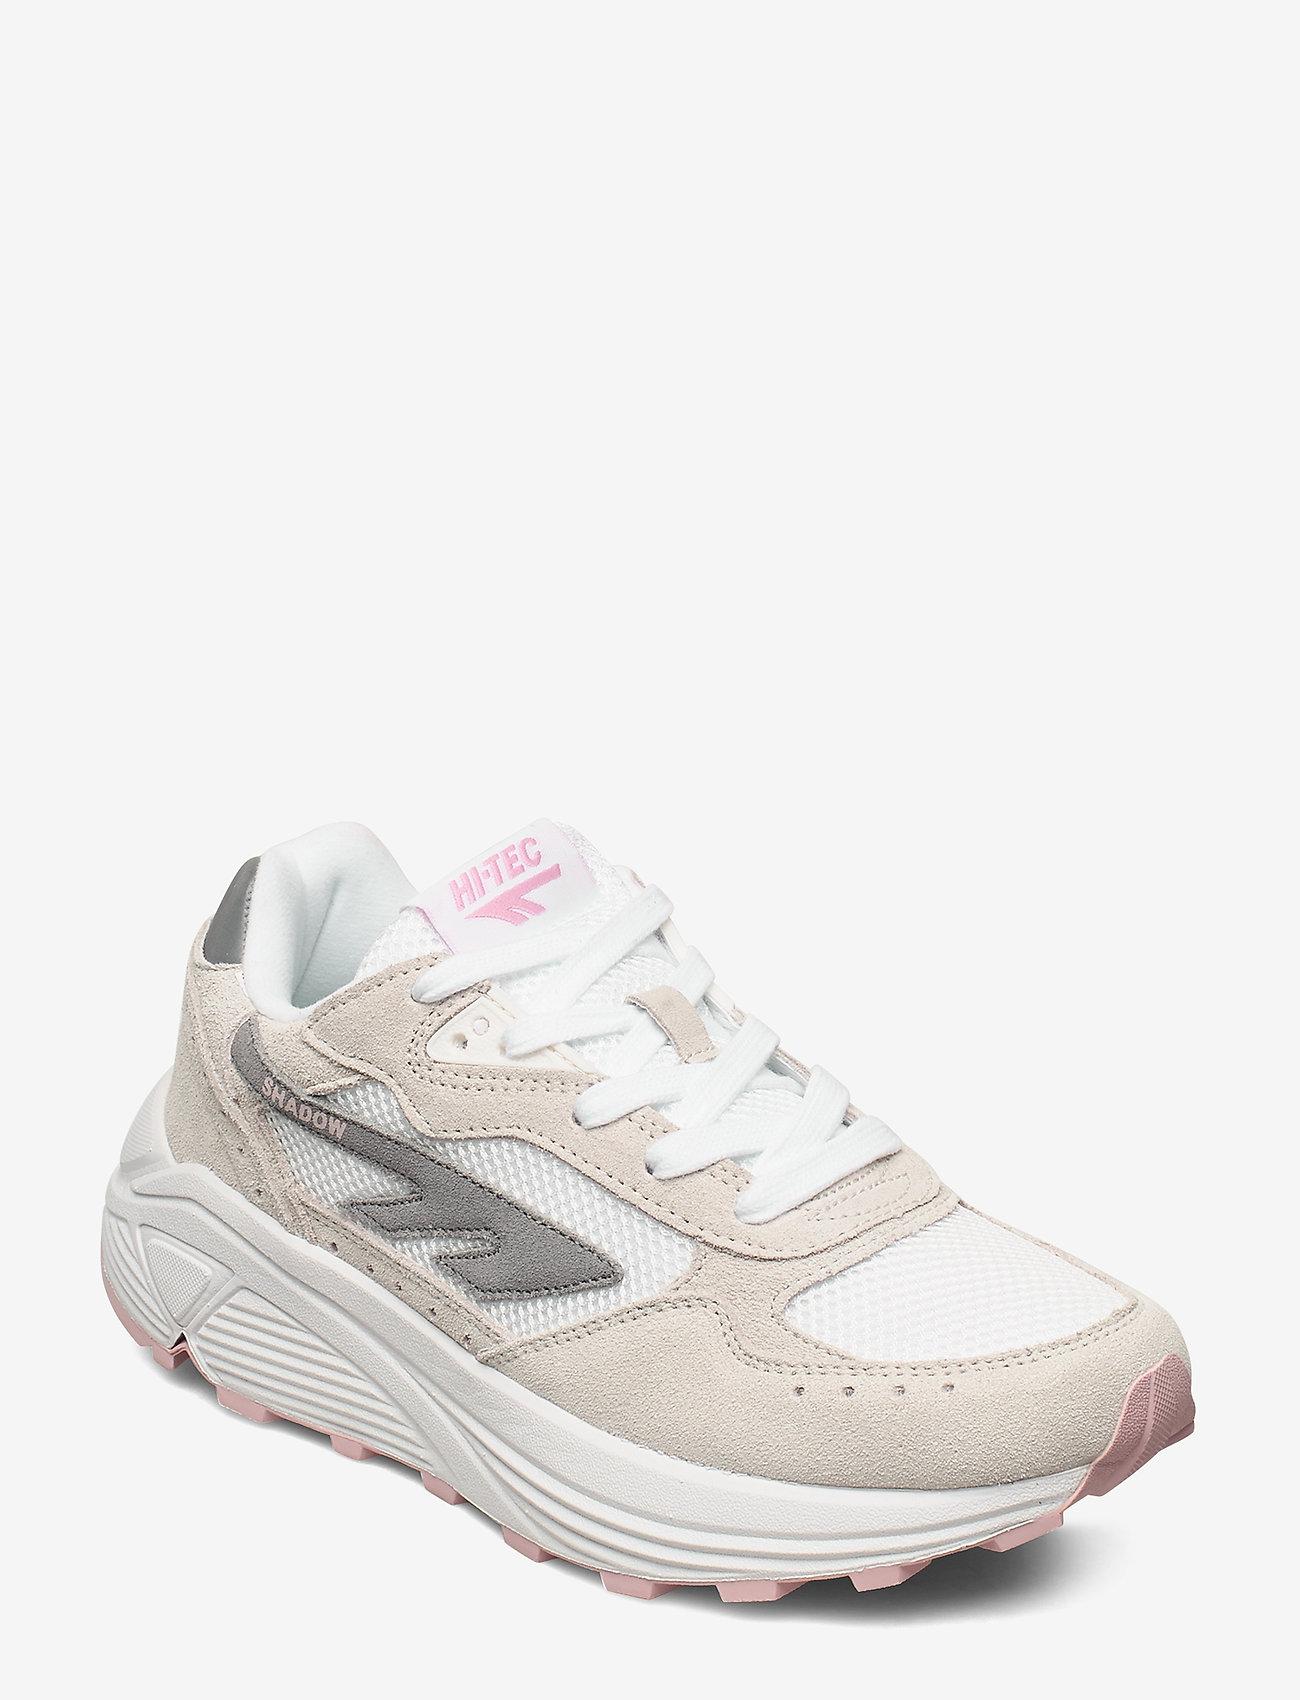 Hi-Tec - HT HTS SHADOW RGS OFF WHT-PEACH - sneakers med lav ankel - off wht-peach - 0